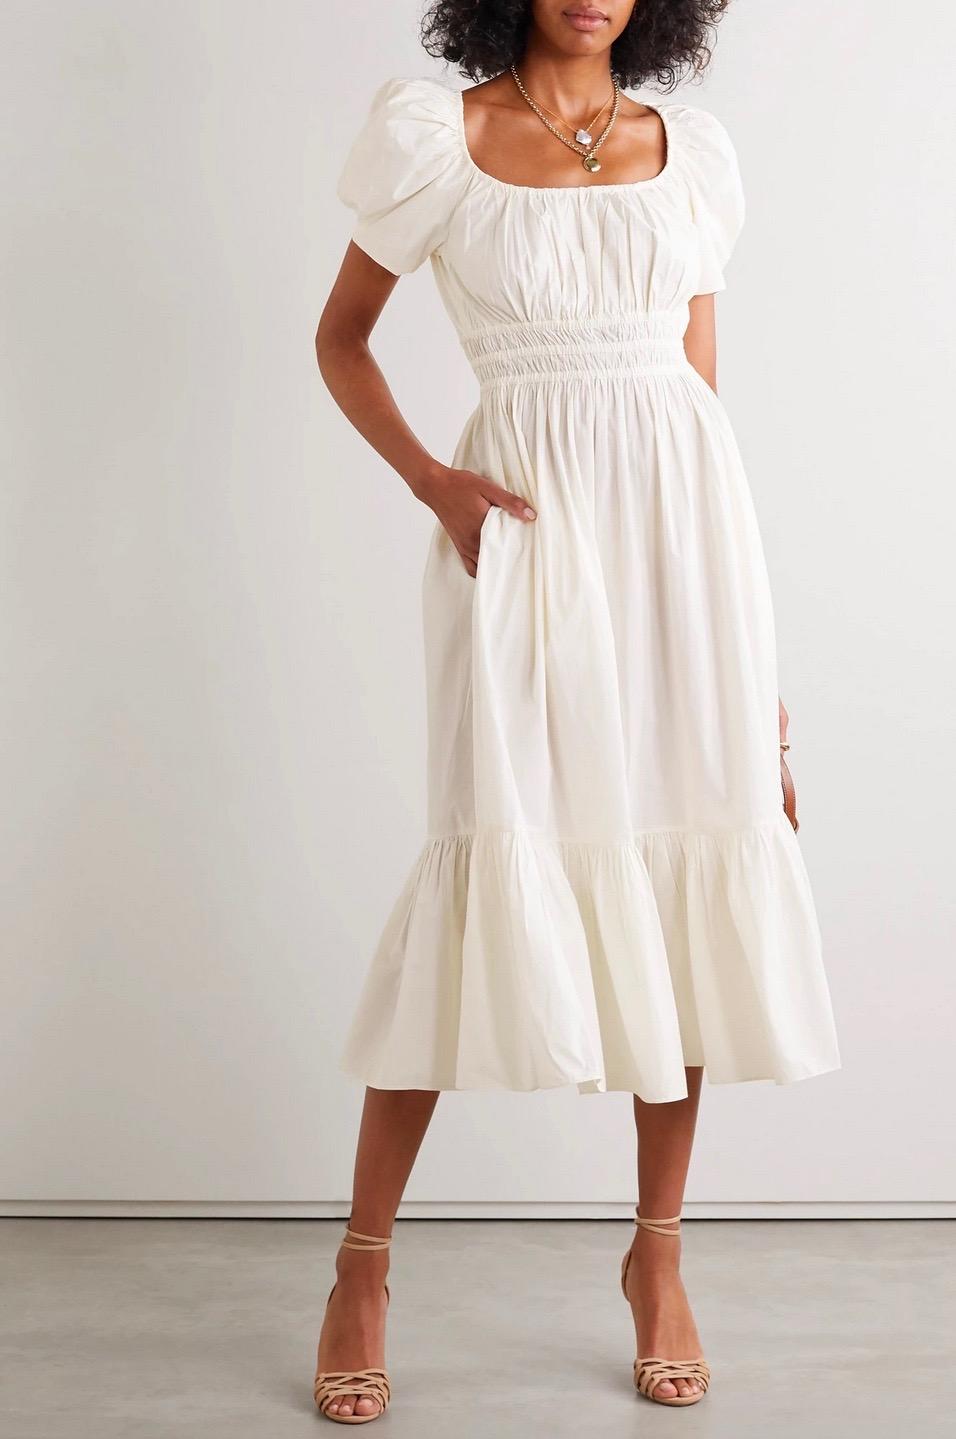 24 White Summer Dresses To Celebrate The Season In Style White Dress Summer Summer Dresses Dresses [ 1439 x 956 Pixel ]